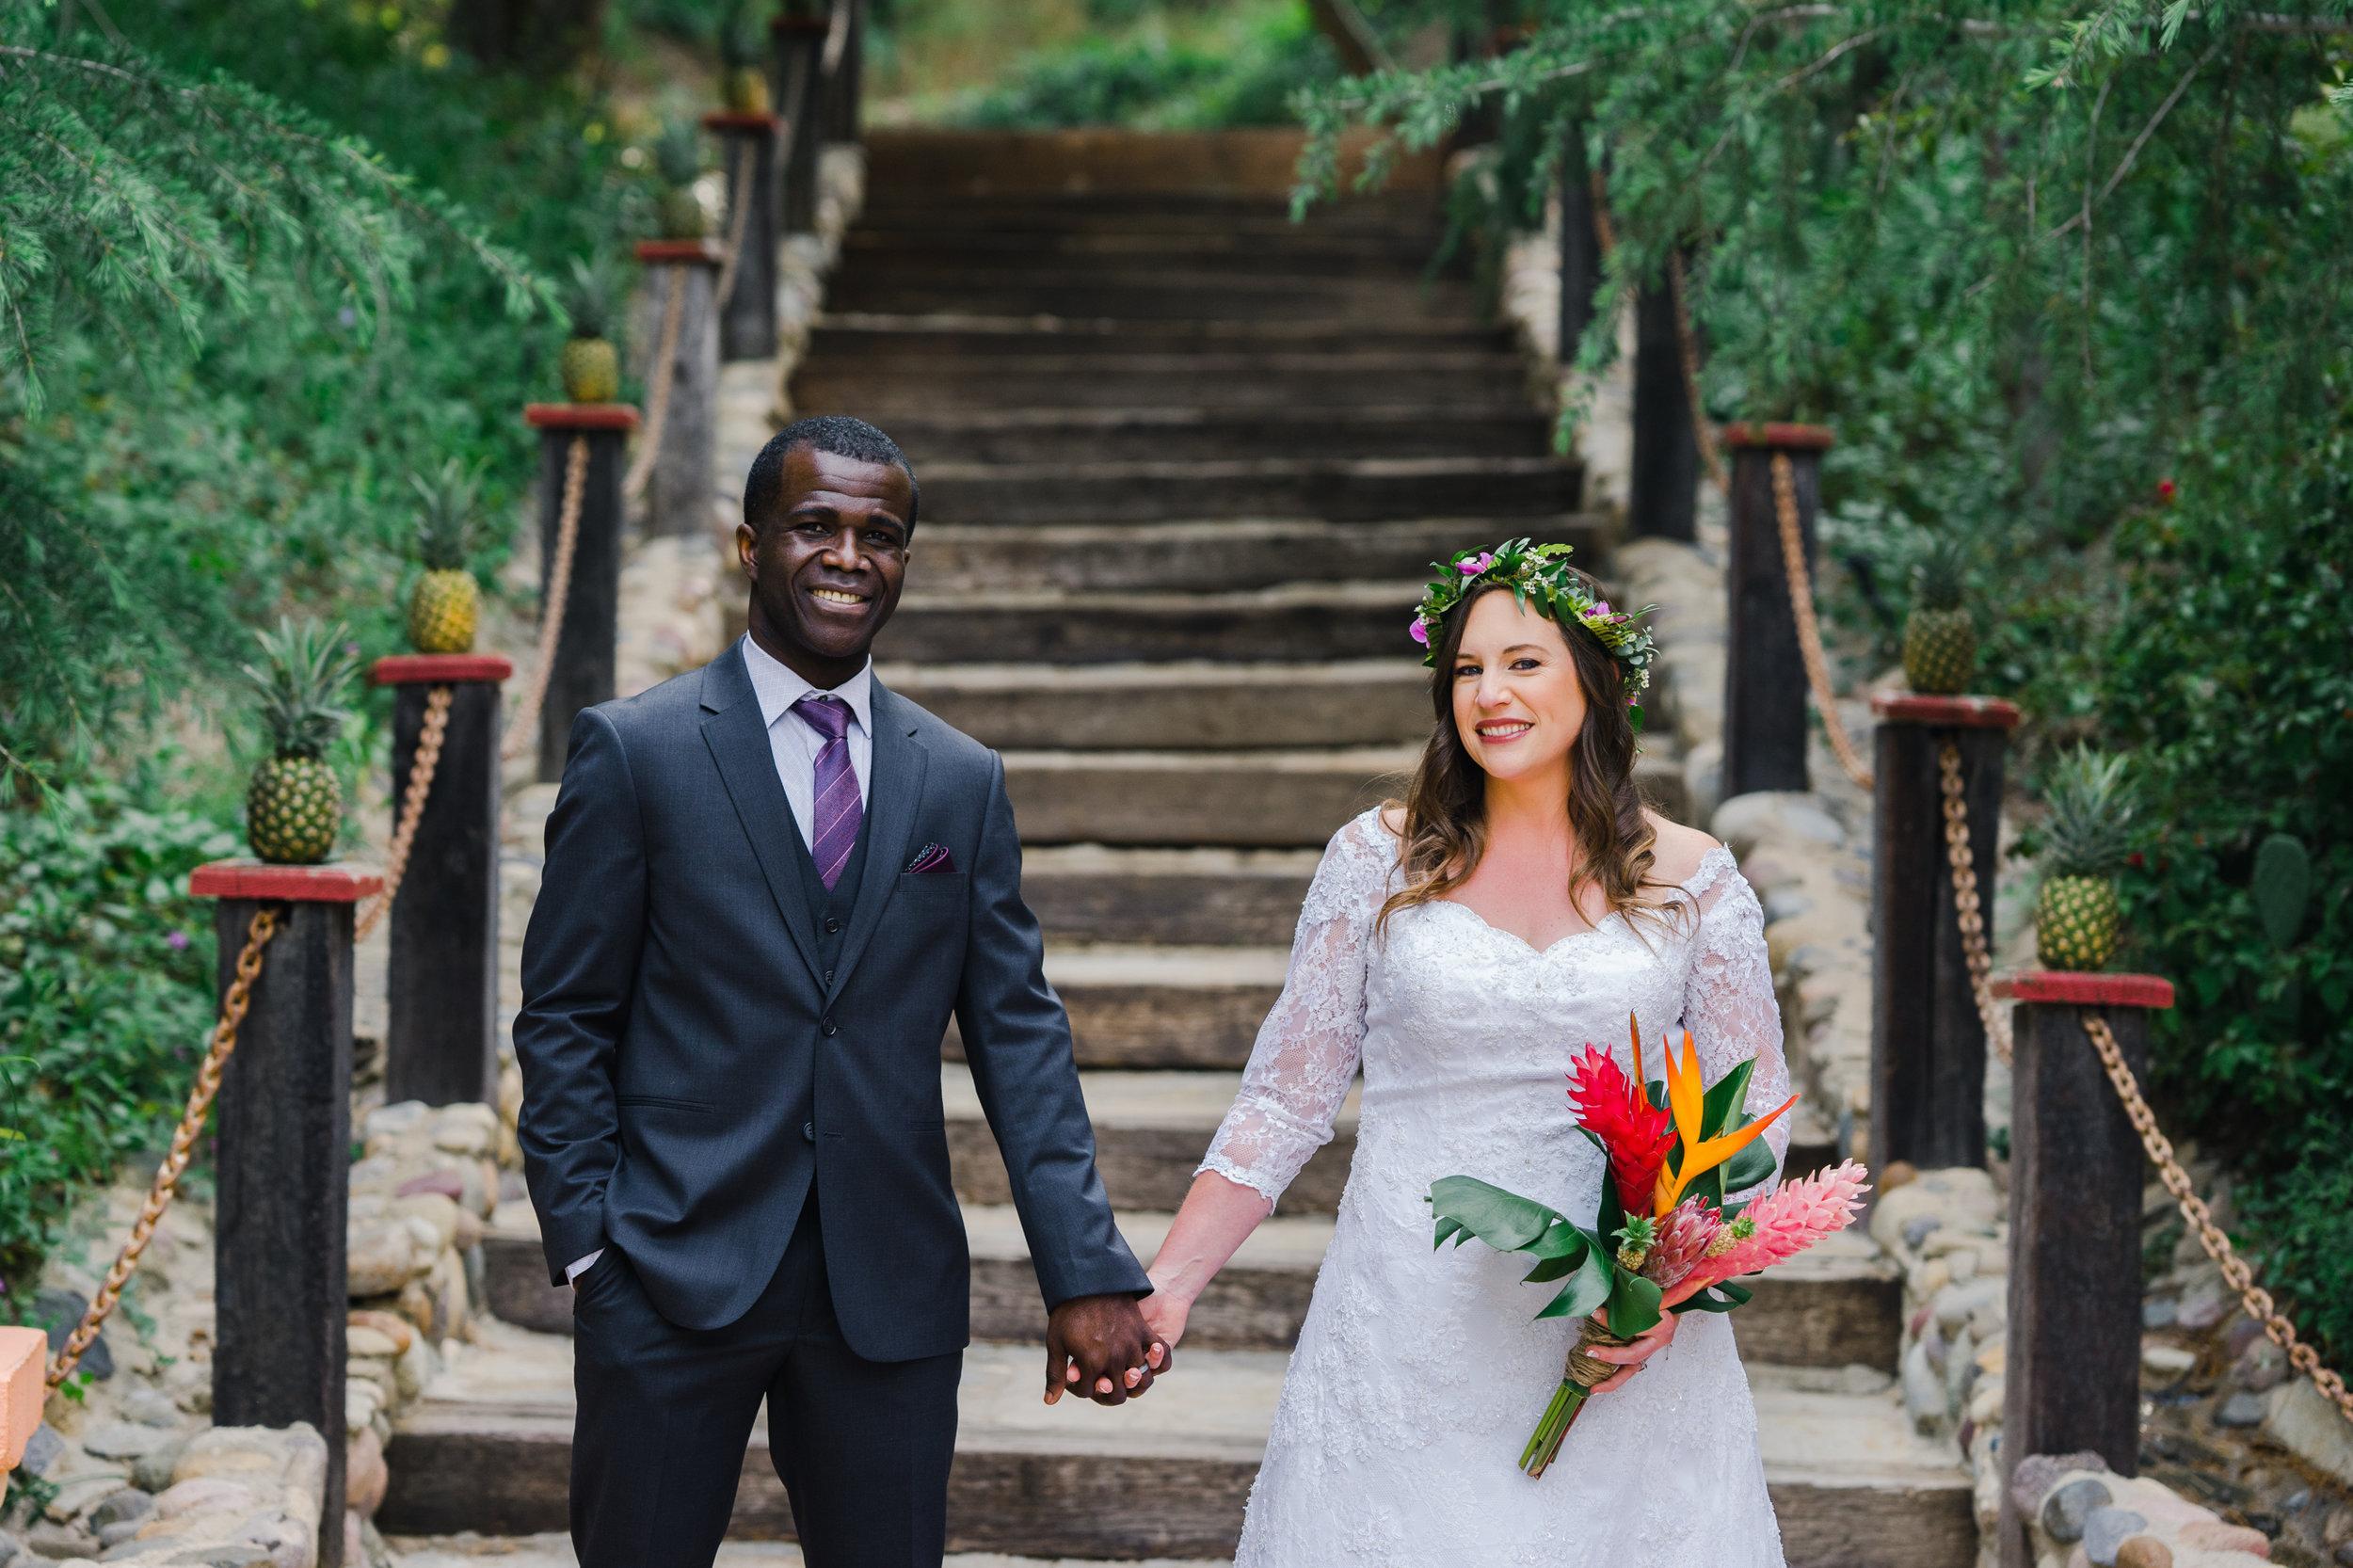 rancho-las-lomas-wedding-kelsey-sim_0166.JPG